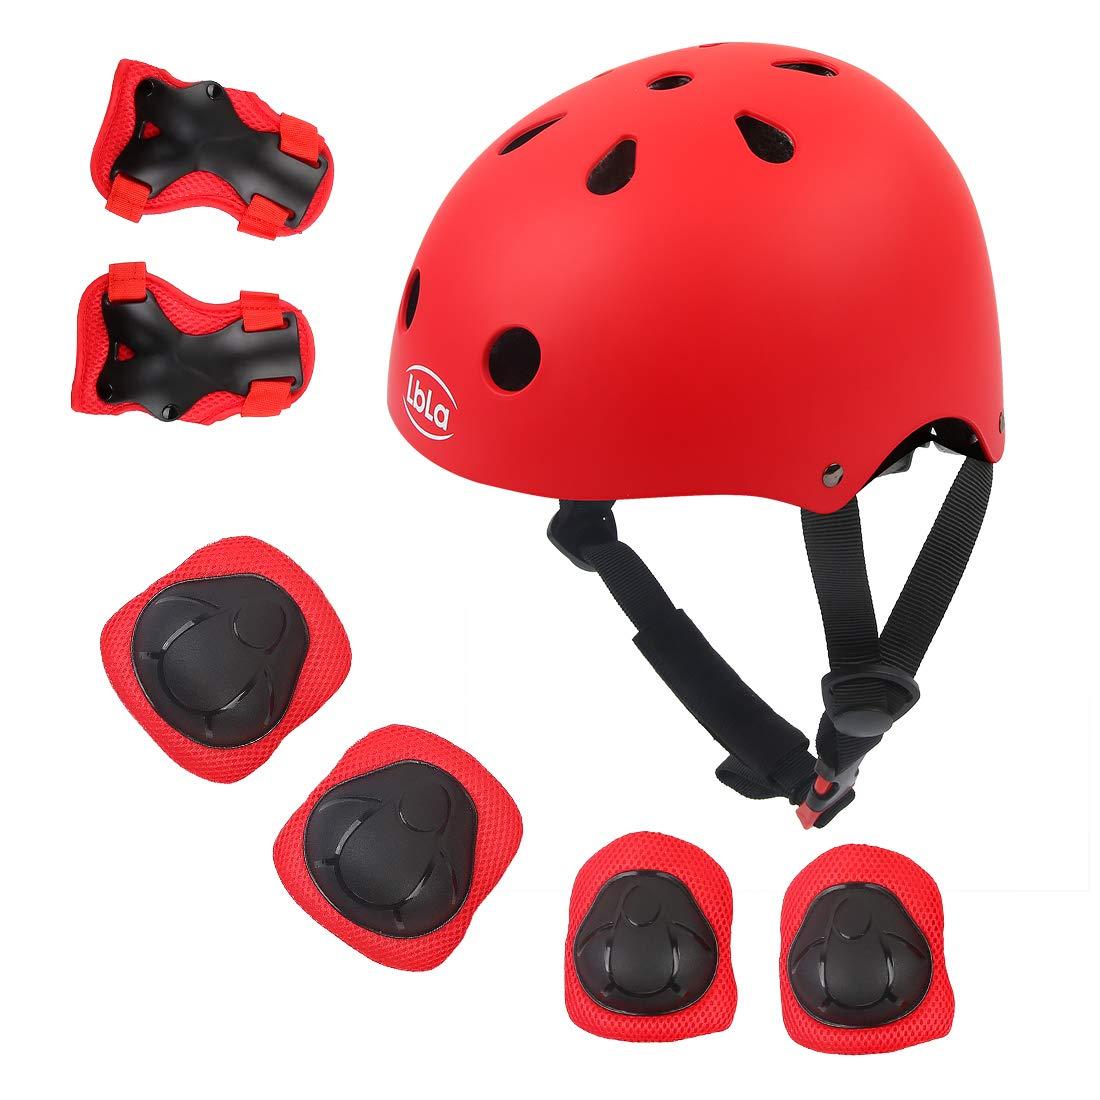 LBLA Helmet and Pads for Kids 3-8 Years Toddler Helmet,Kids Bike Skateboard Helmet,Helmet Knee Elbow Wrist for Scooter,7Pcs Adjustable Protective Gear Set for Kids(Red